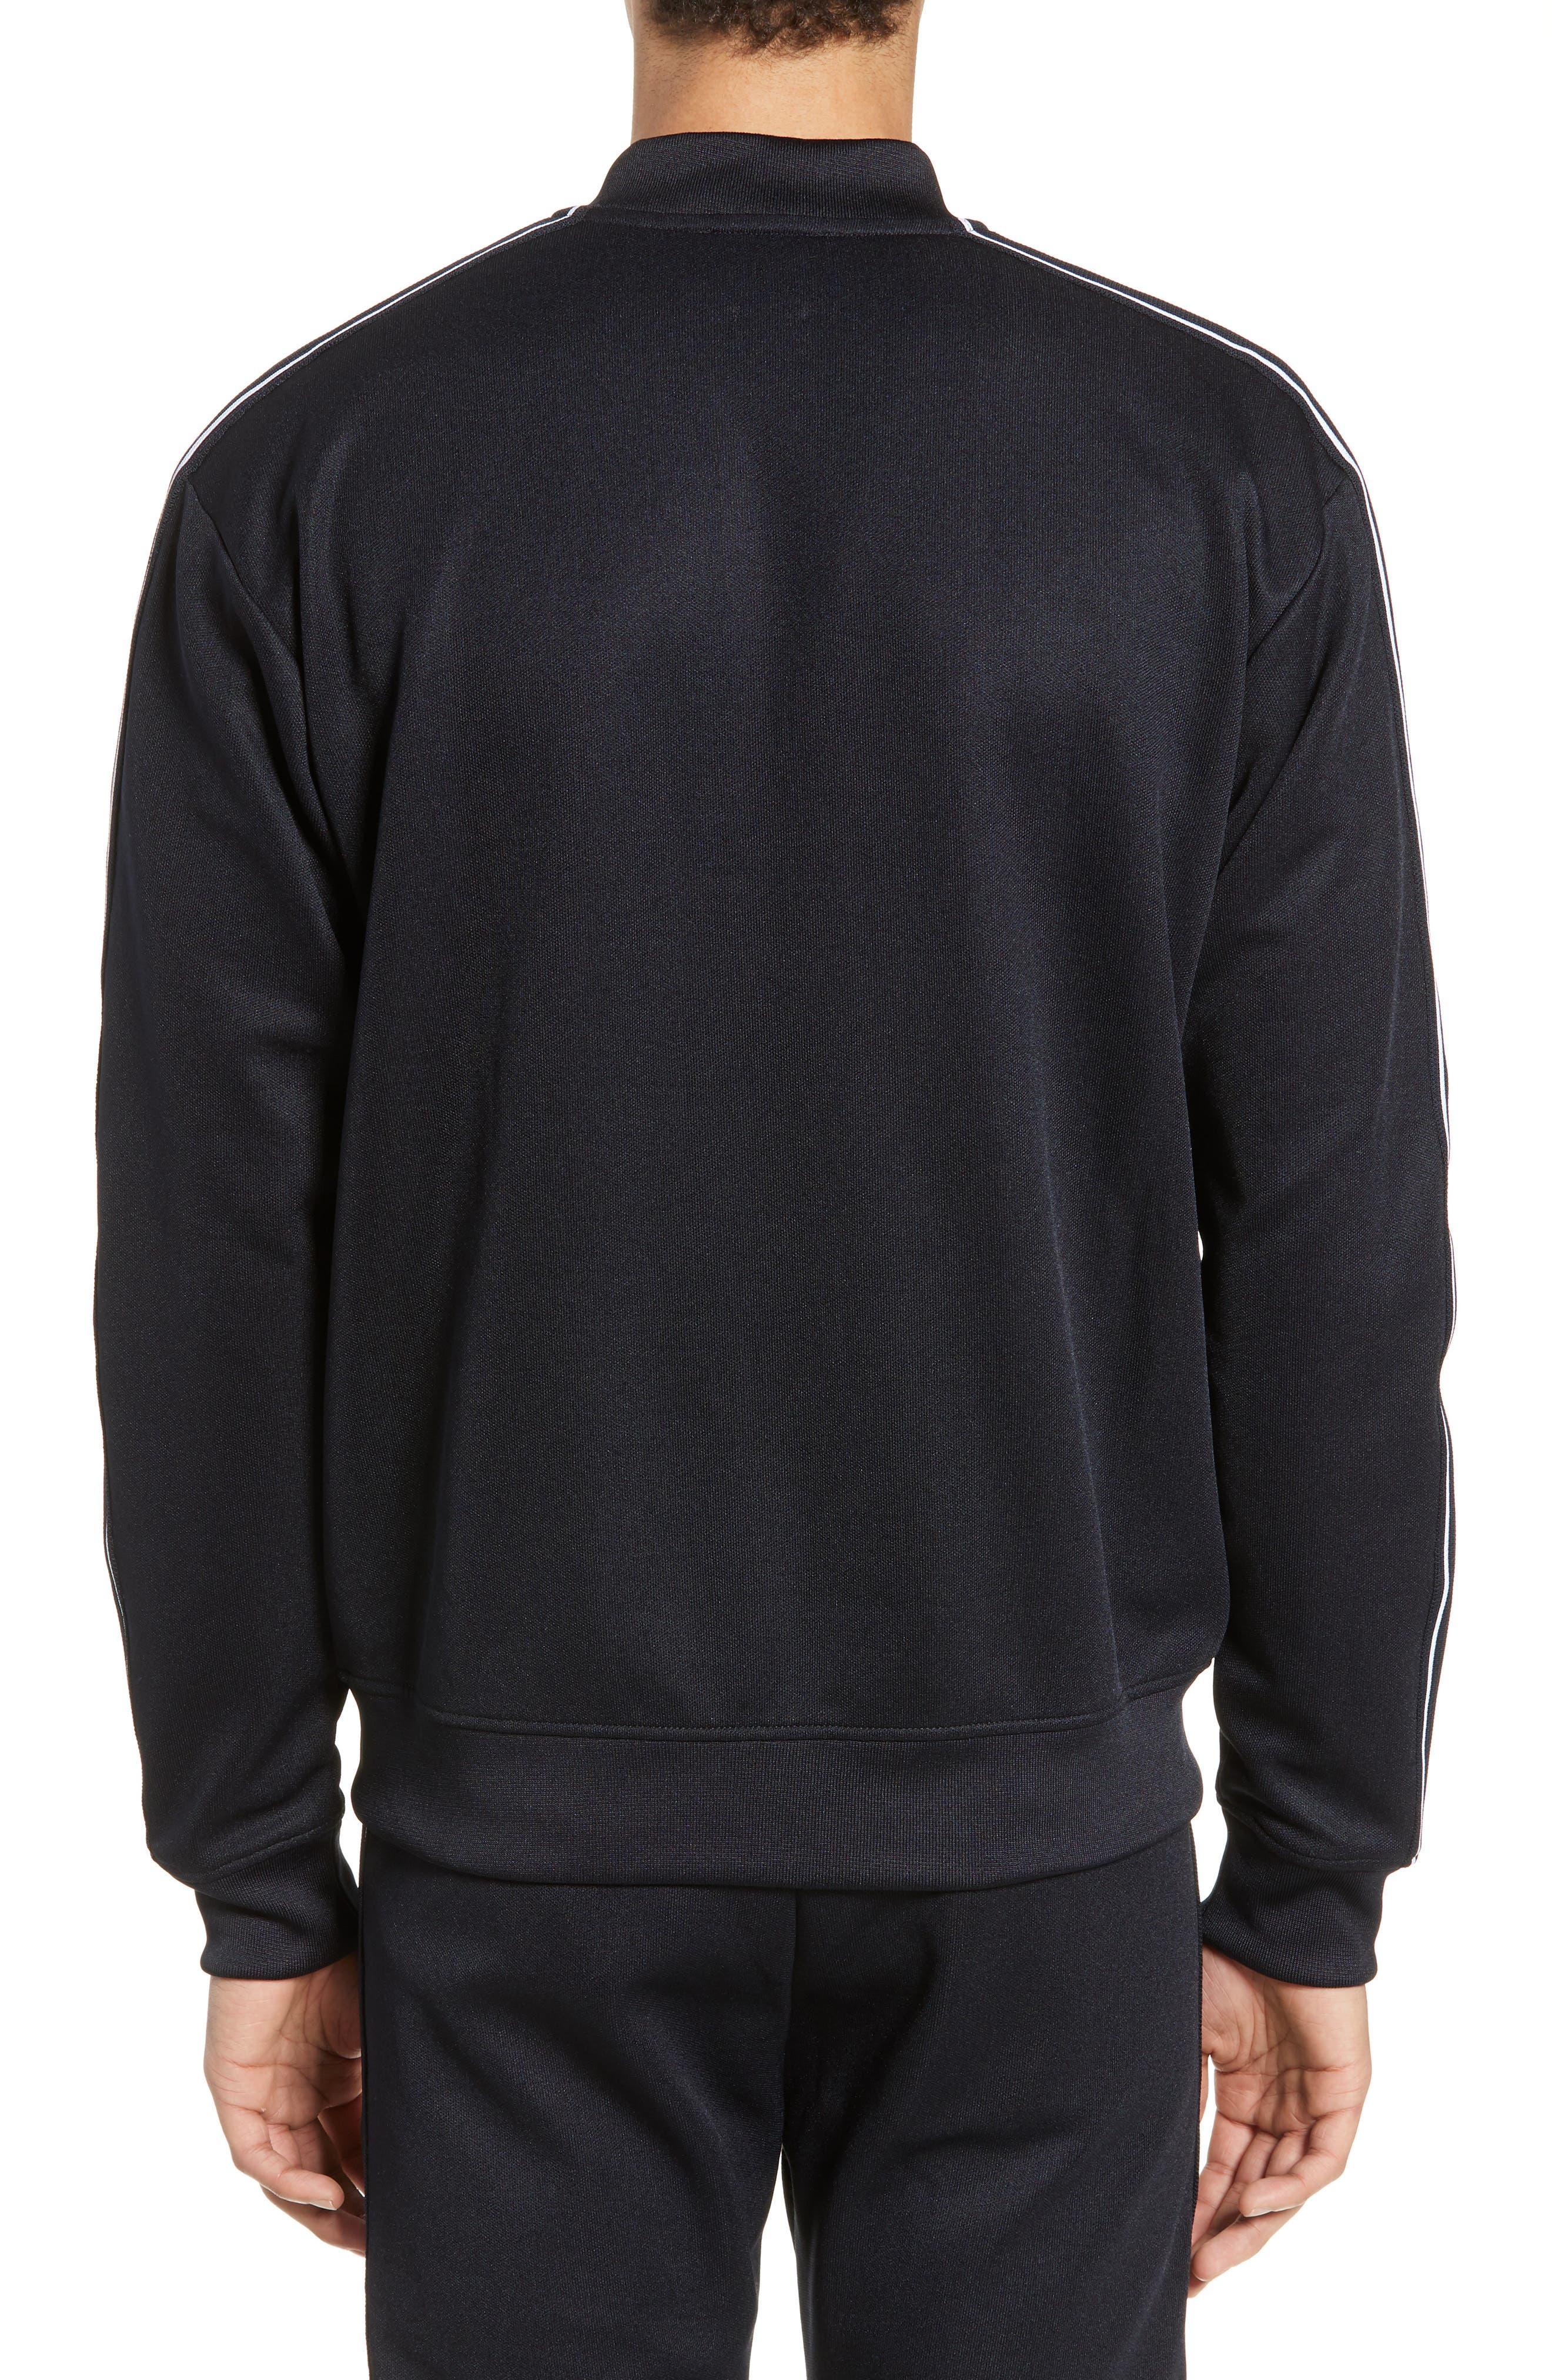 THE KOOPLES, Full Zip Sweatshirt, Alternate thumbnail 2, color, NAVY